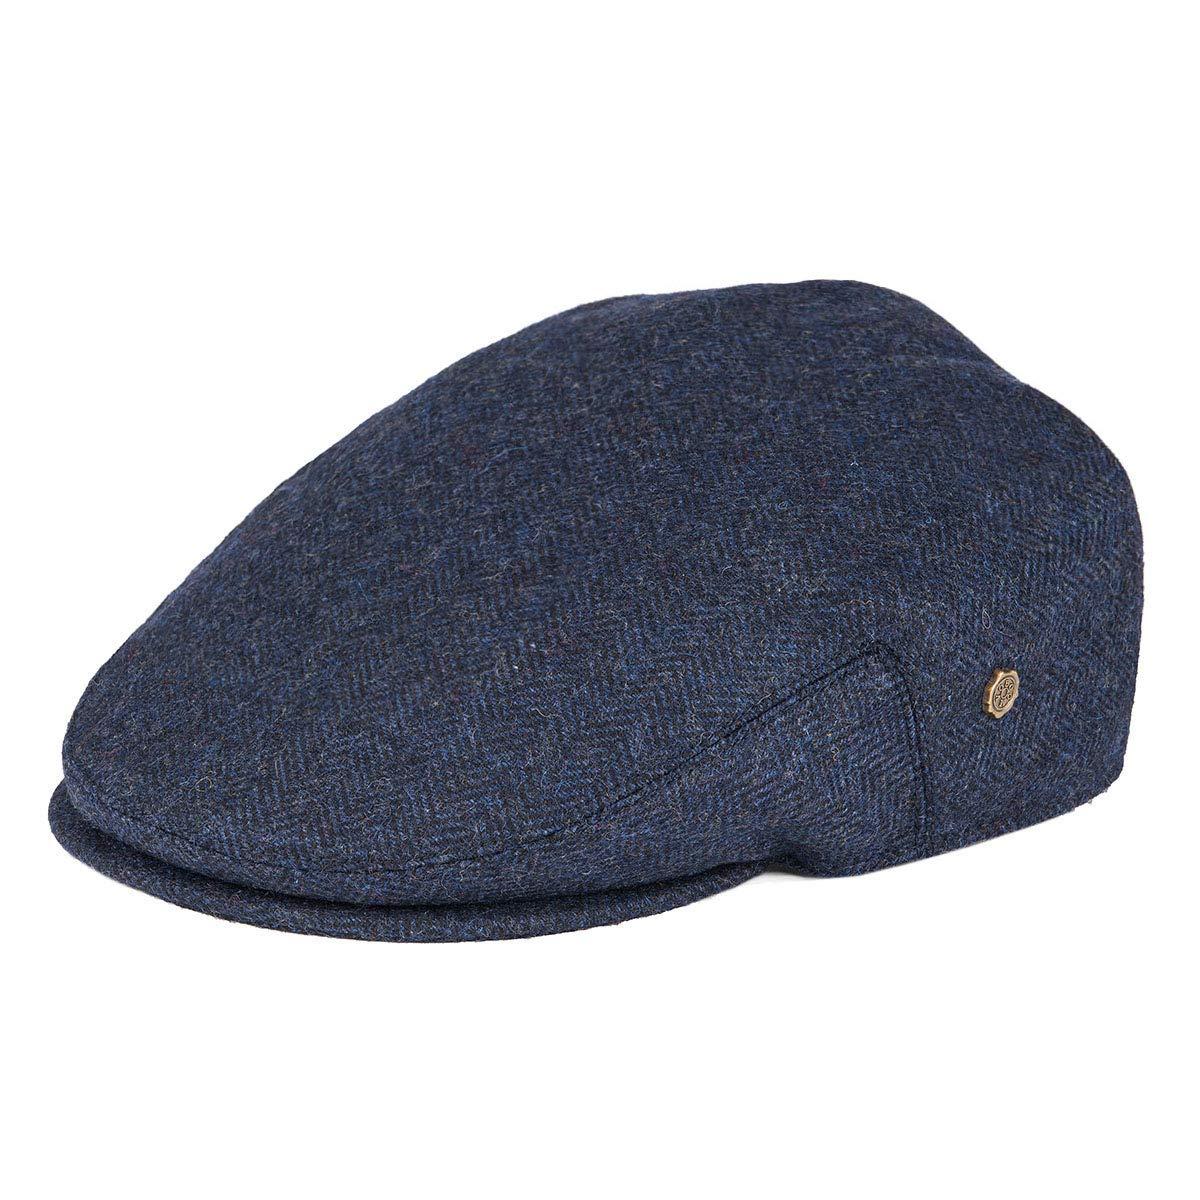 VOBOOM Mens Herringbone Flat Ivy Newsboy Hat Wool Blend Gatsby Cabbie Cap